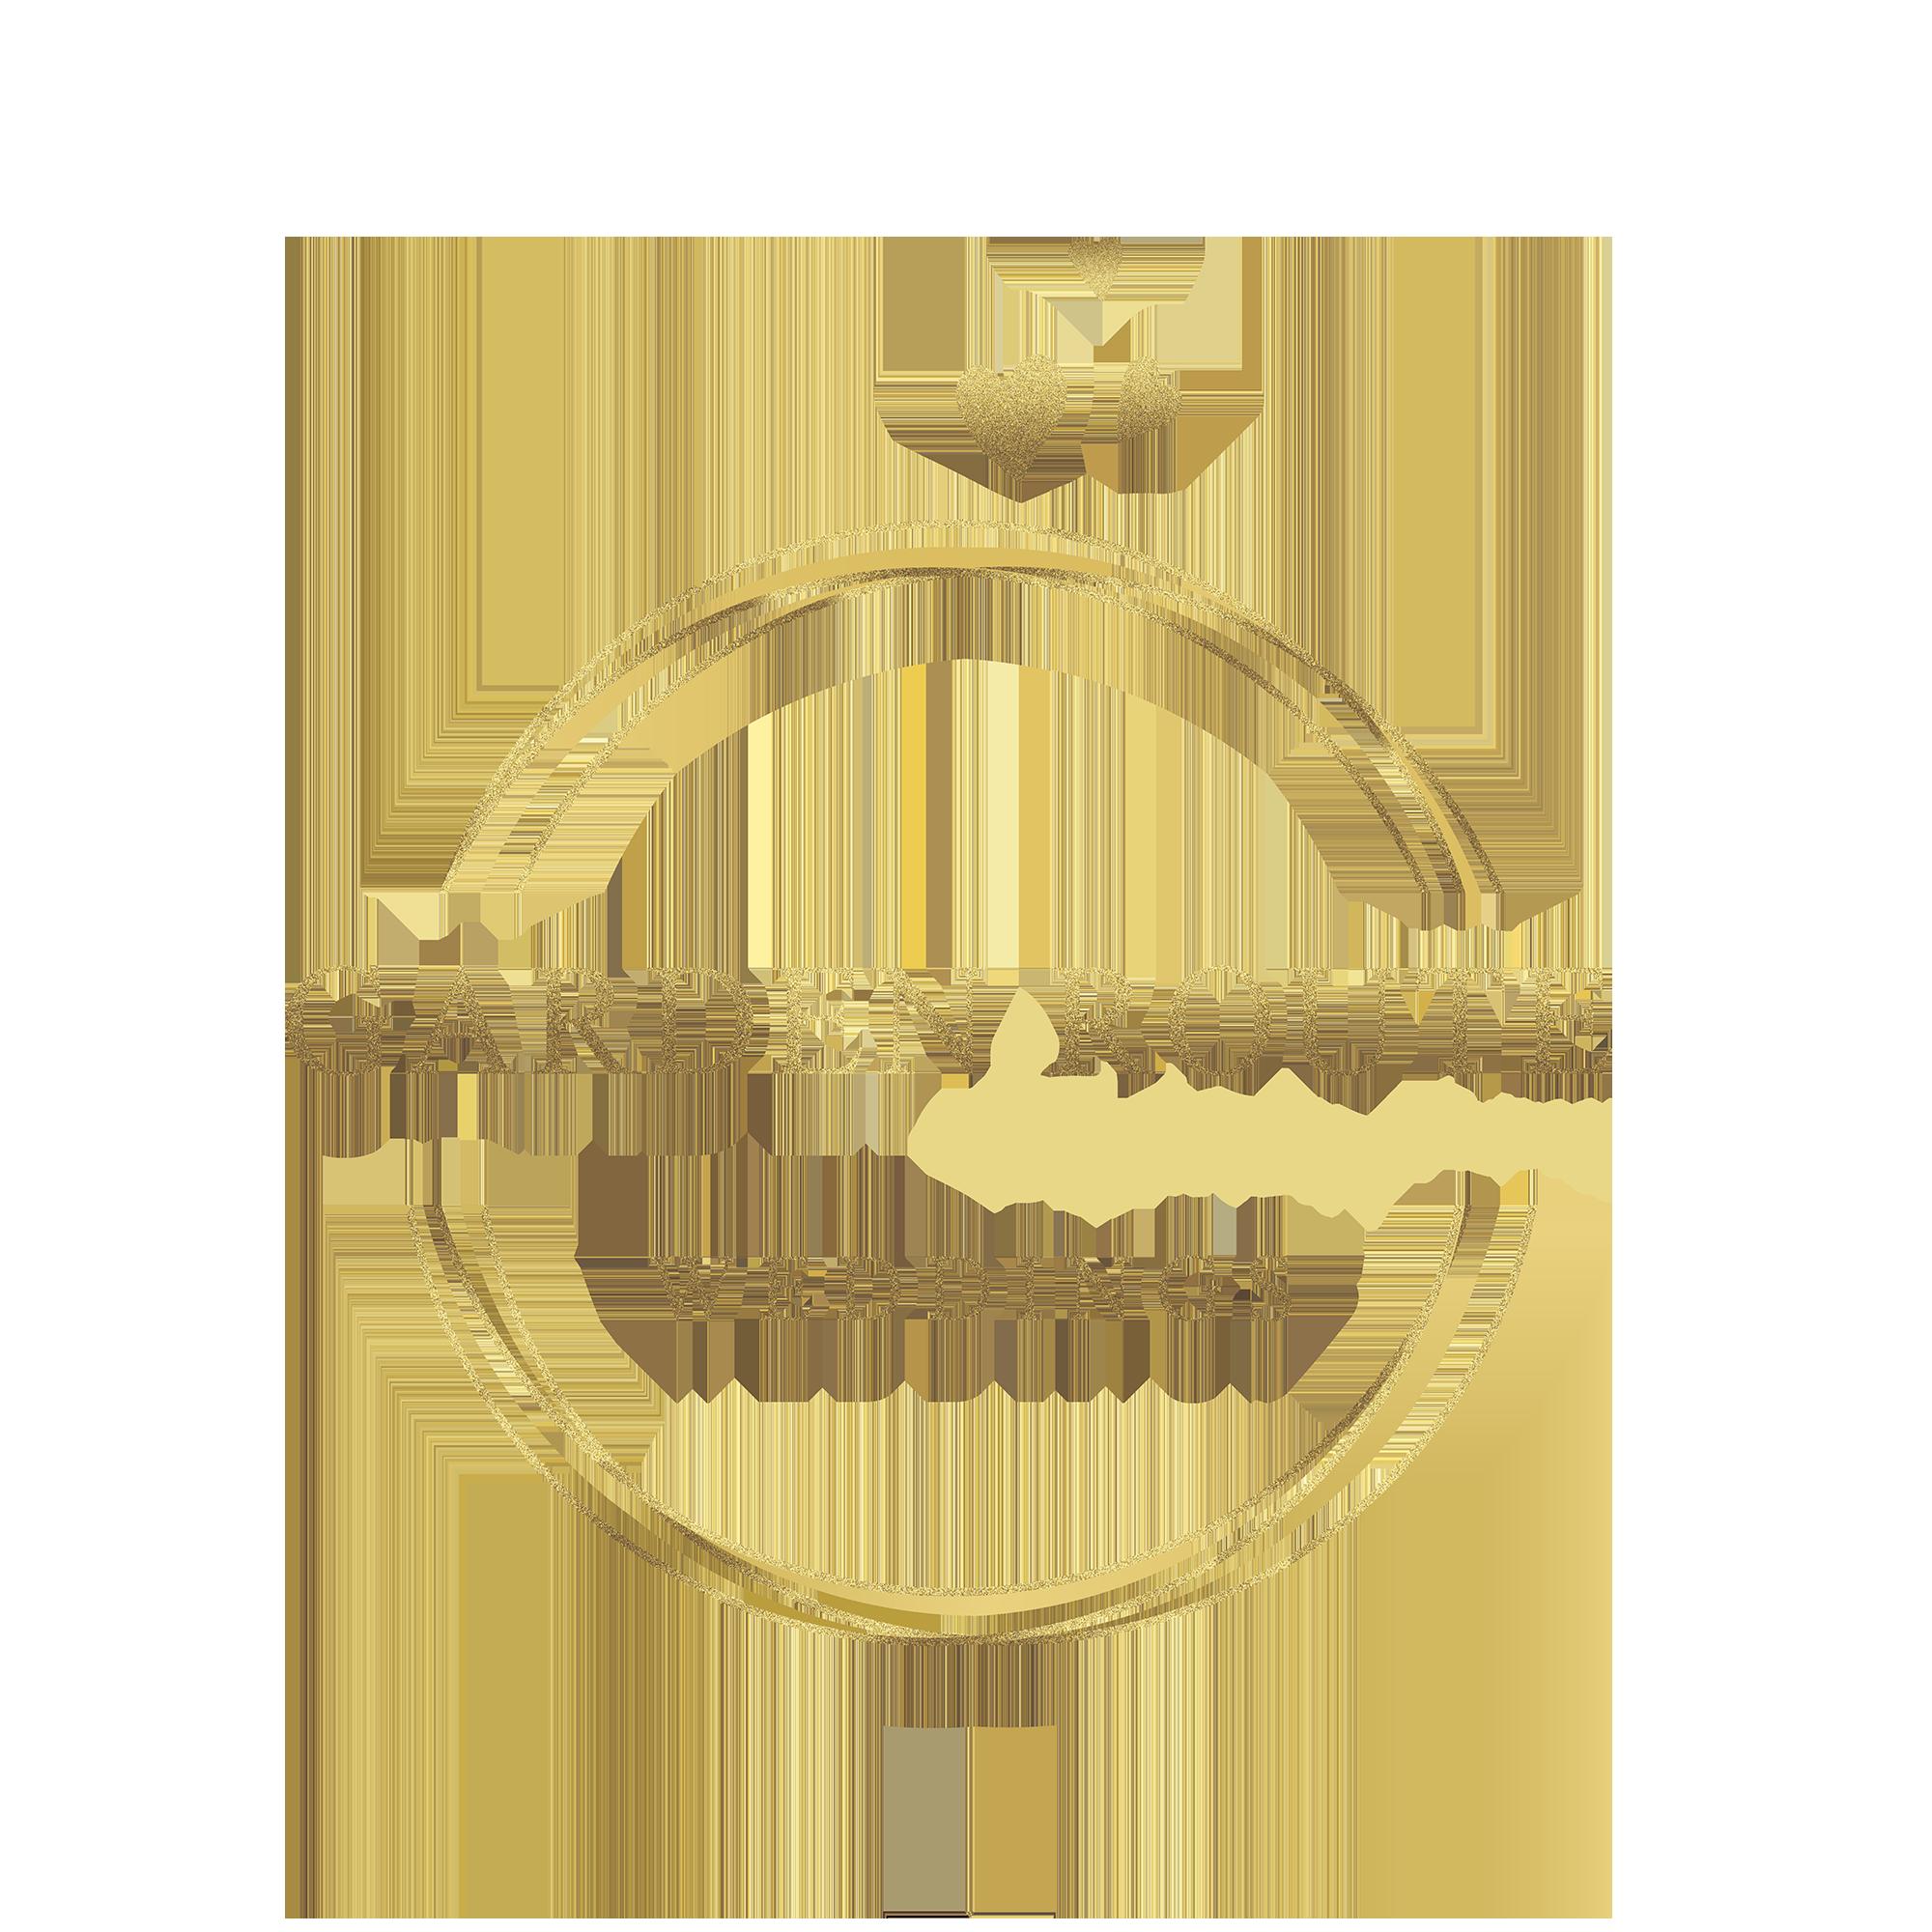 Darrell Fraser Creative Director Garden Route and Klein Karoo Branding